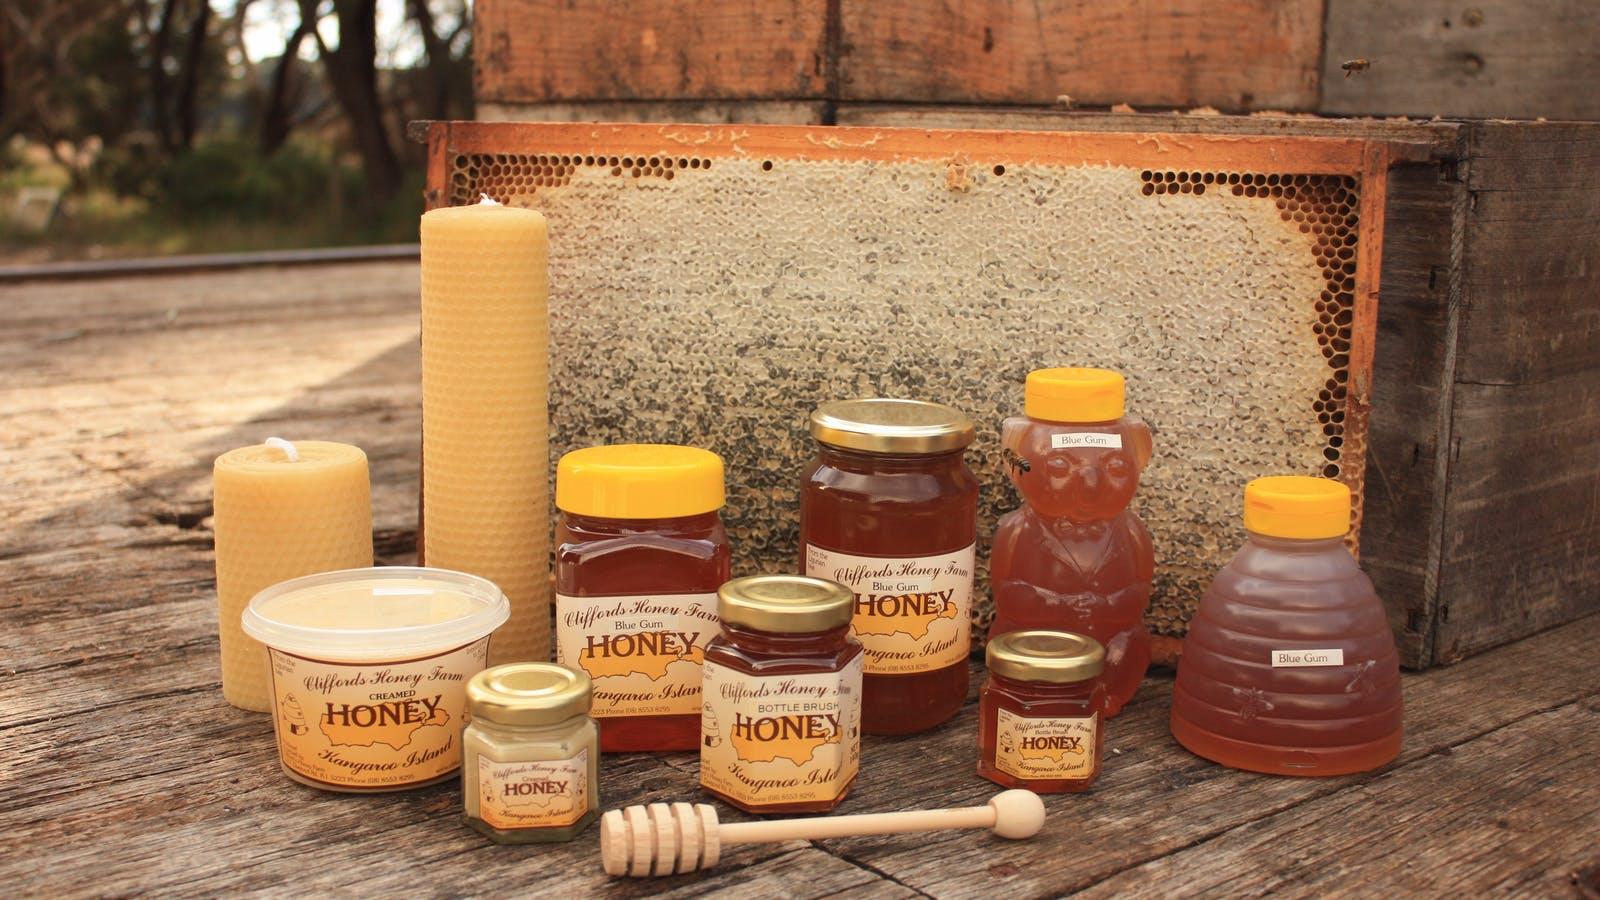 HIS Travel South Australia Clifford's Honey Farm